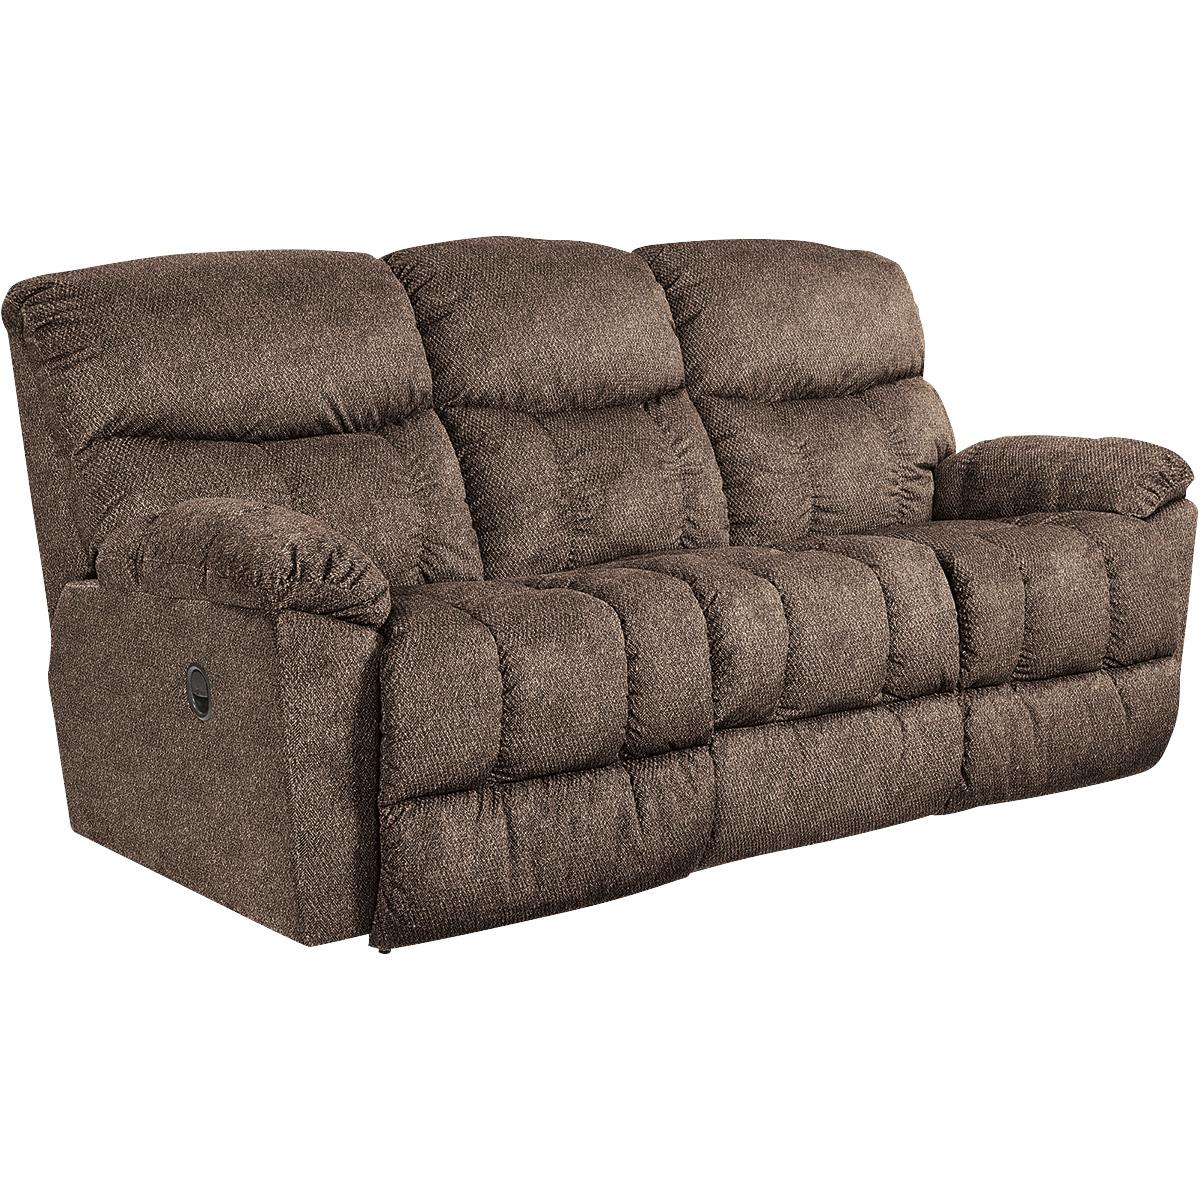 La-Z-Boy | Morrison Cappuccino Reclining Sofa